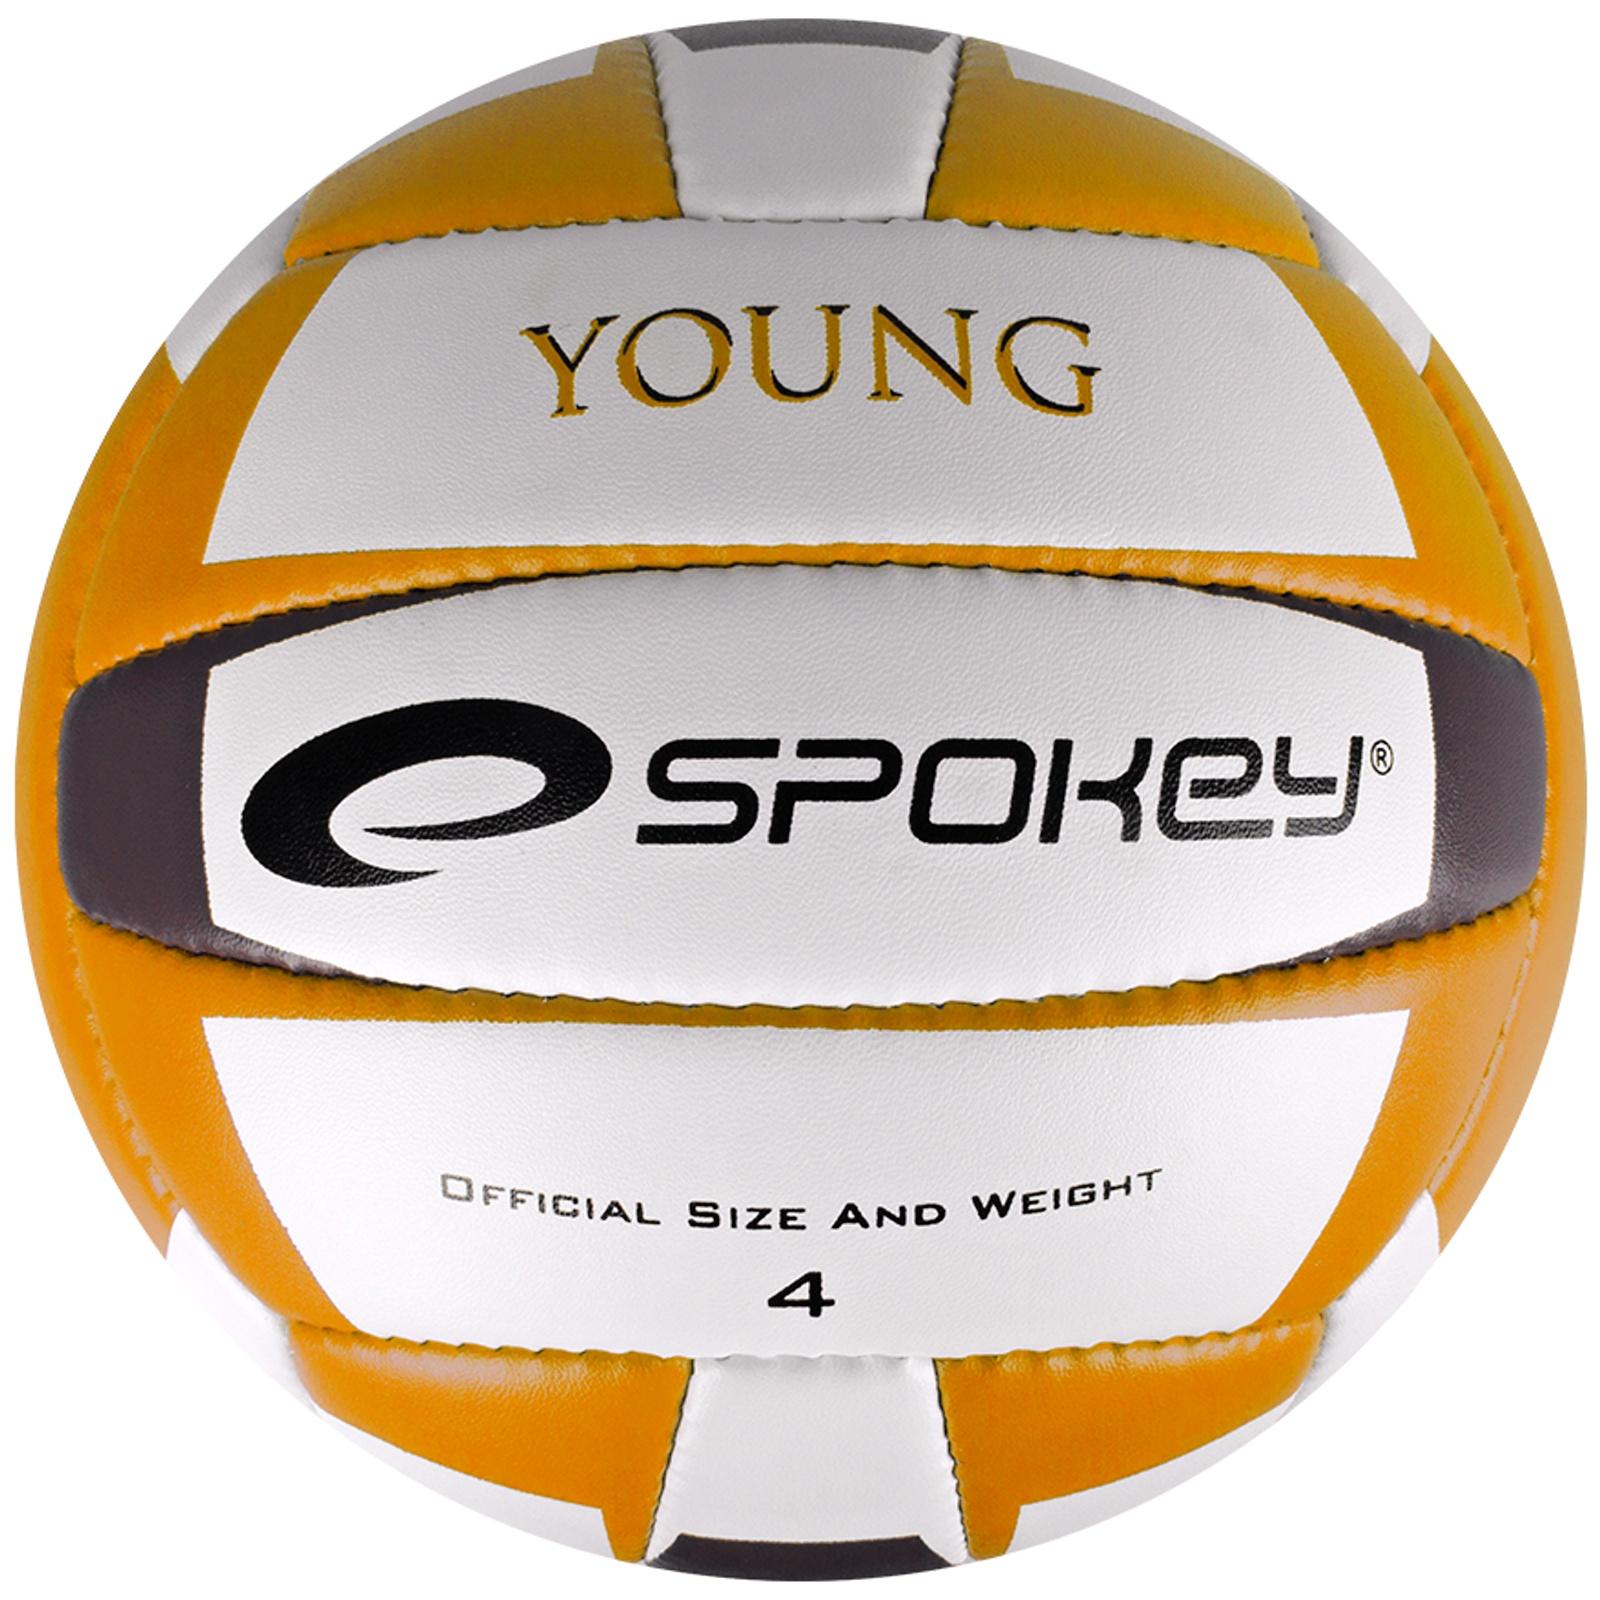 Volejbalový míč SPOKEY Young II žlutý